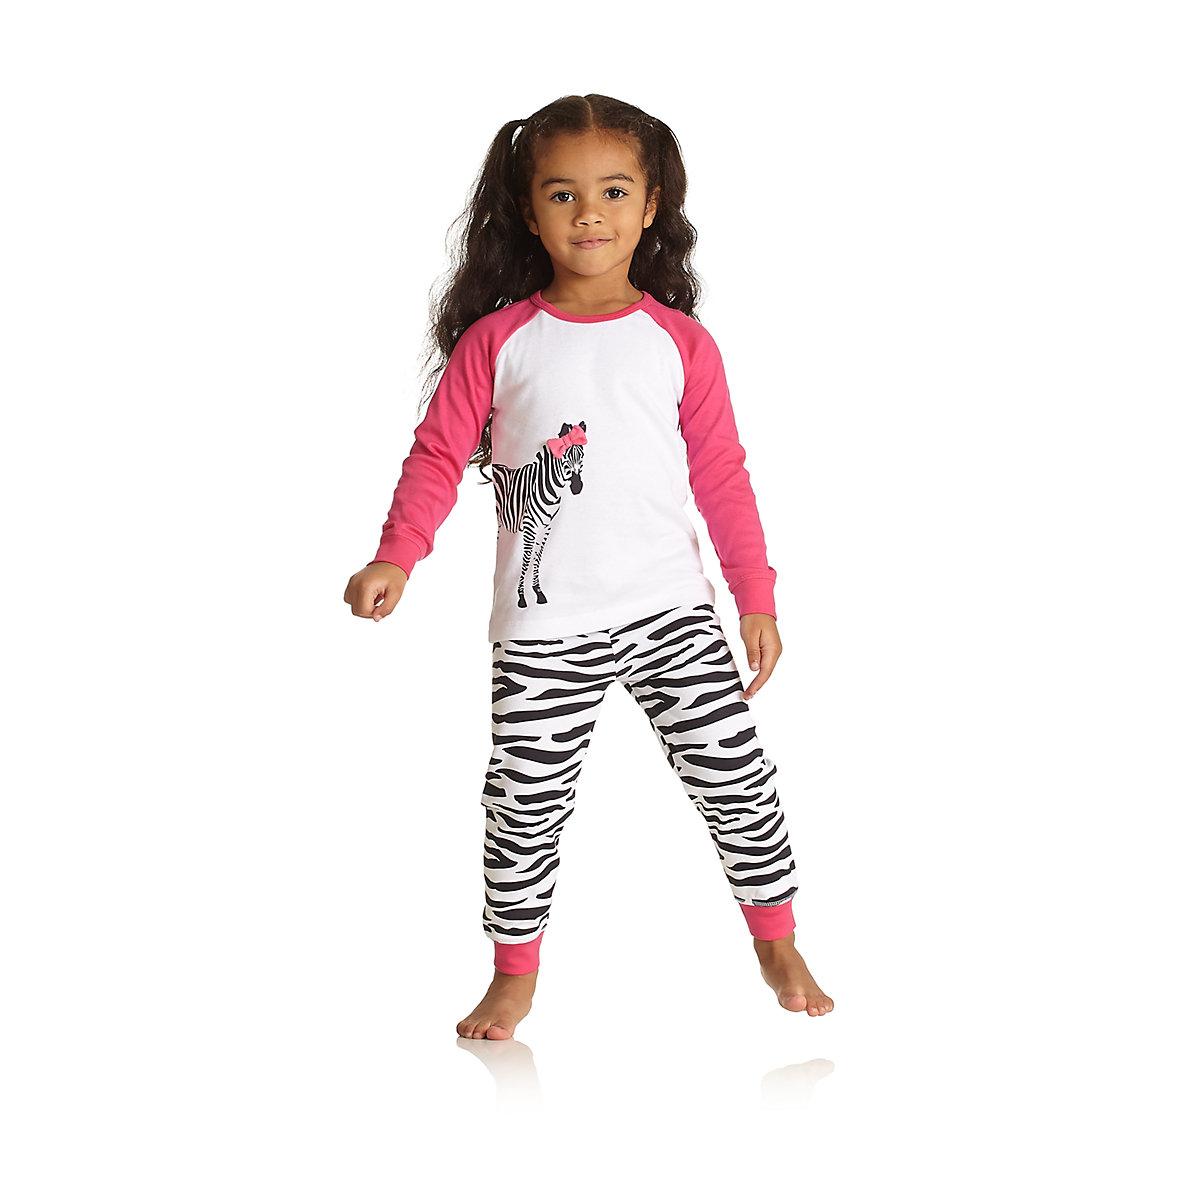 Mothercare Zebra Pyjamas - Zebra Gifts